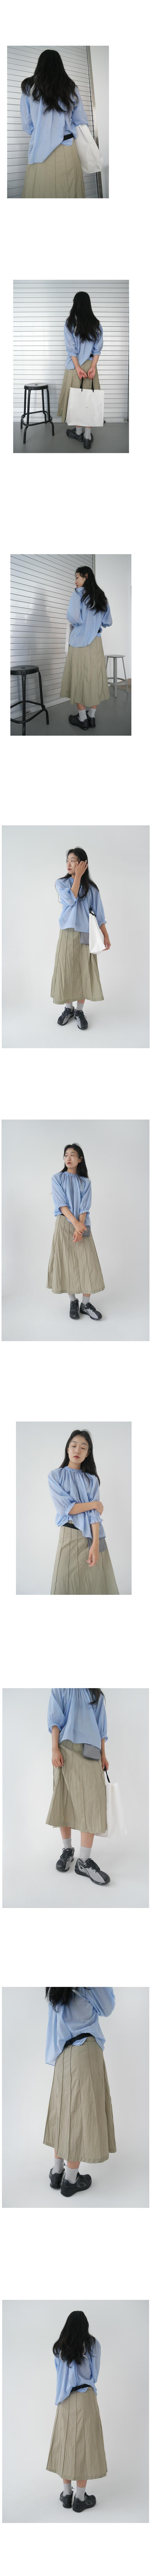 feminine mood lace blouse